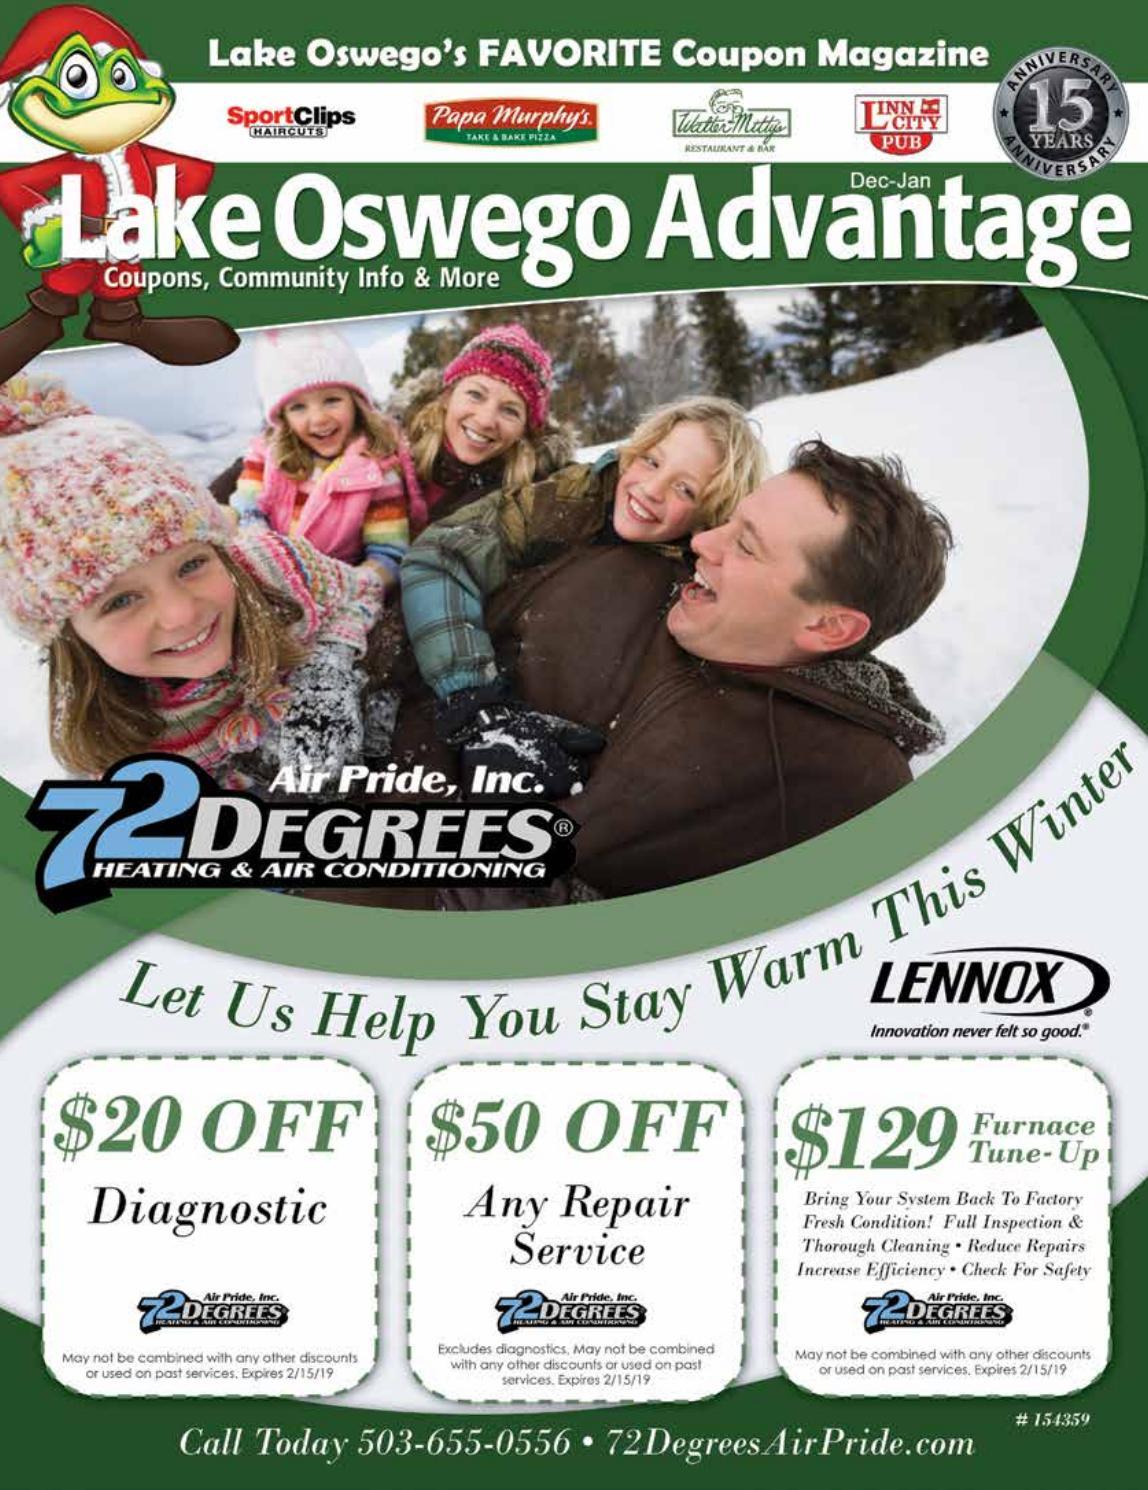 LAKE OSWEGO - Advantage Guide - Dec 2018 by Active Media